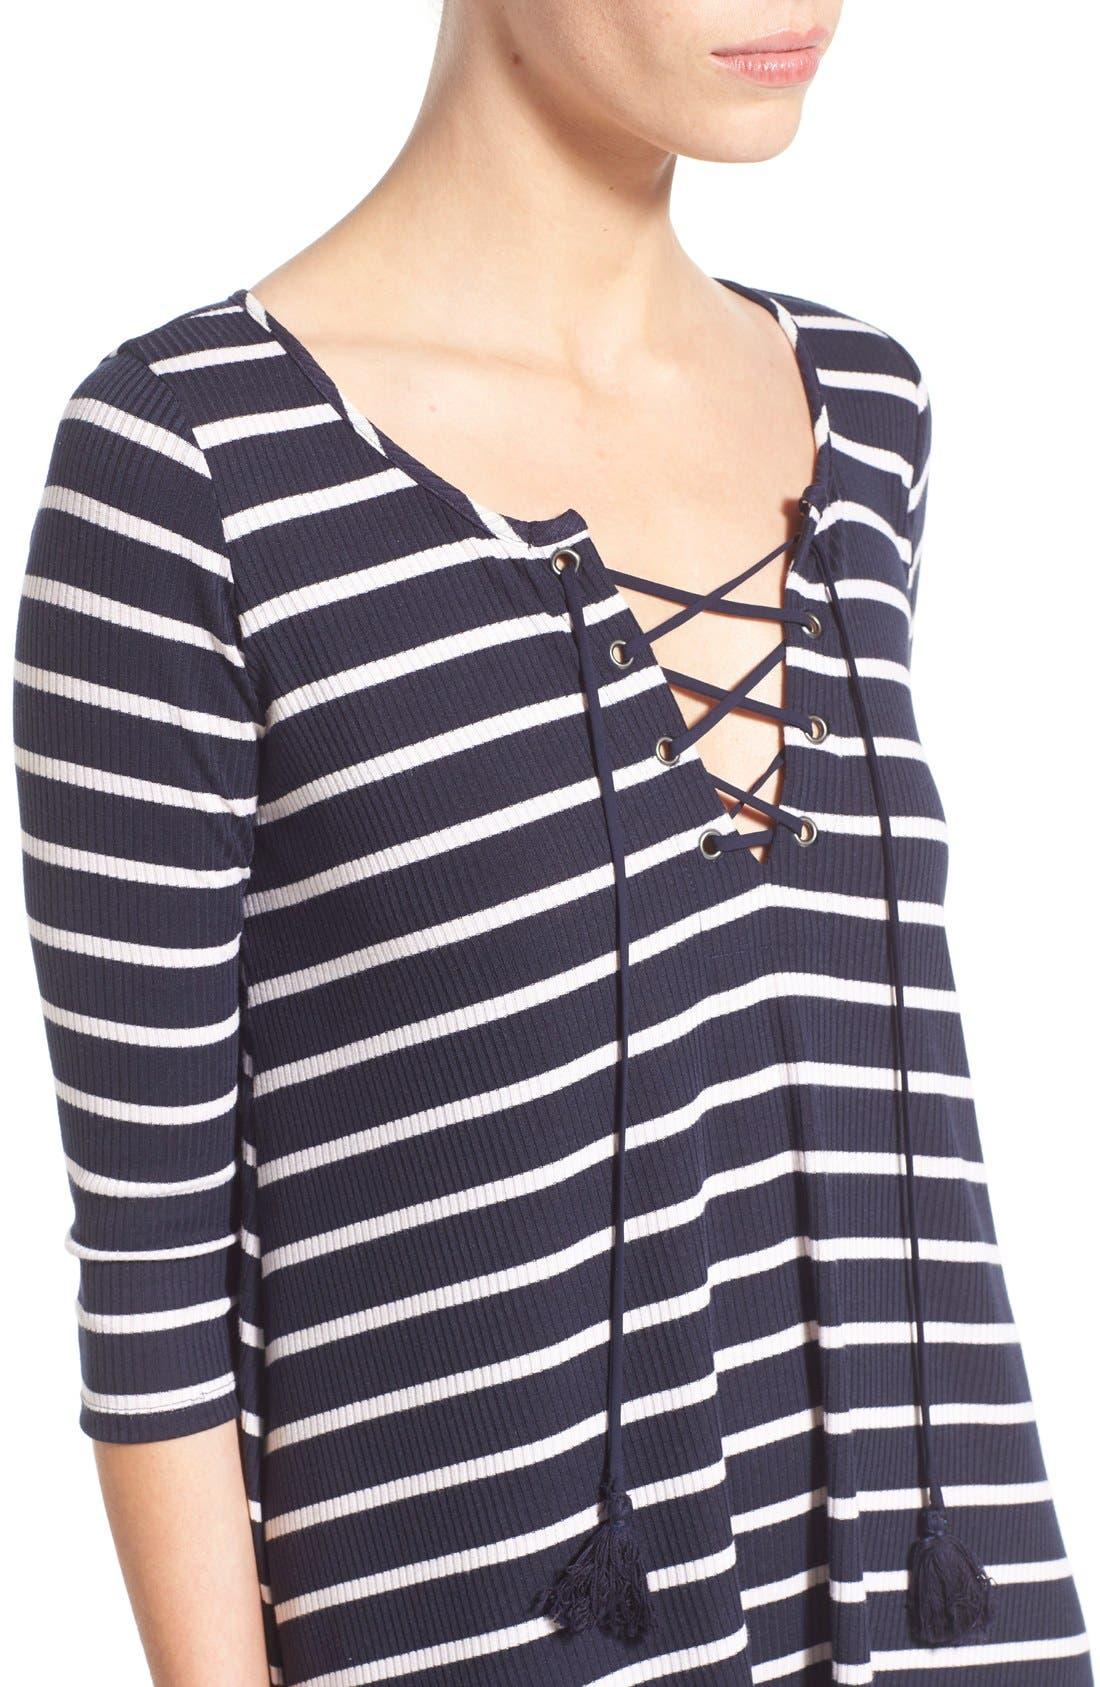 SOCIALITE, Stripe Lace-Up Minidress, Alternate thumbnail 3, color, 466